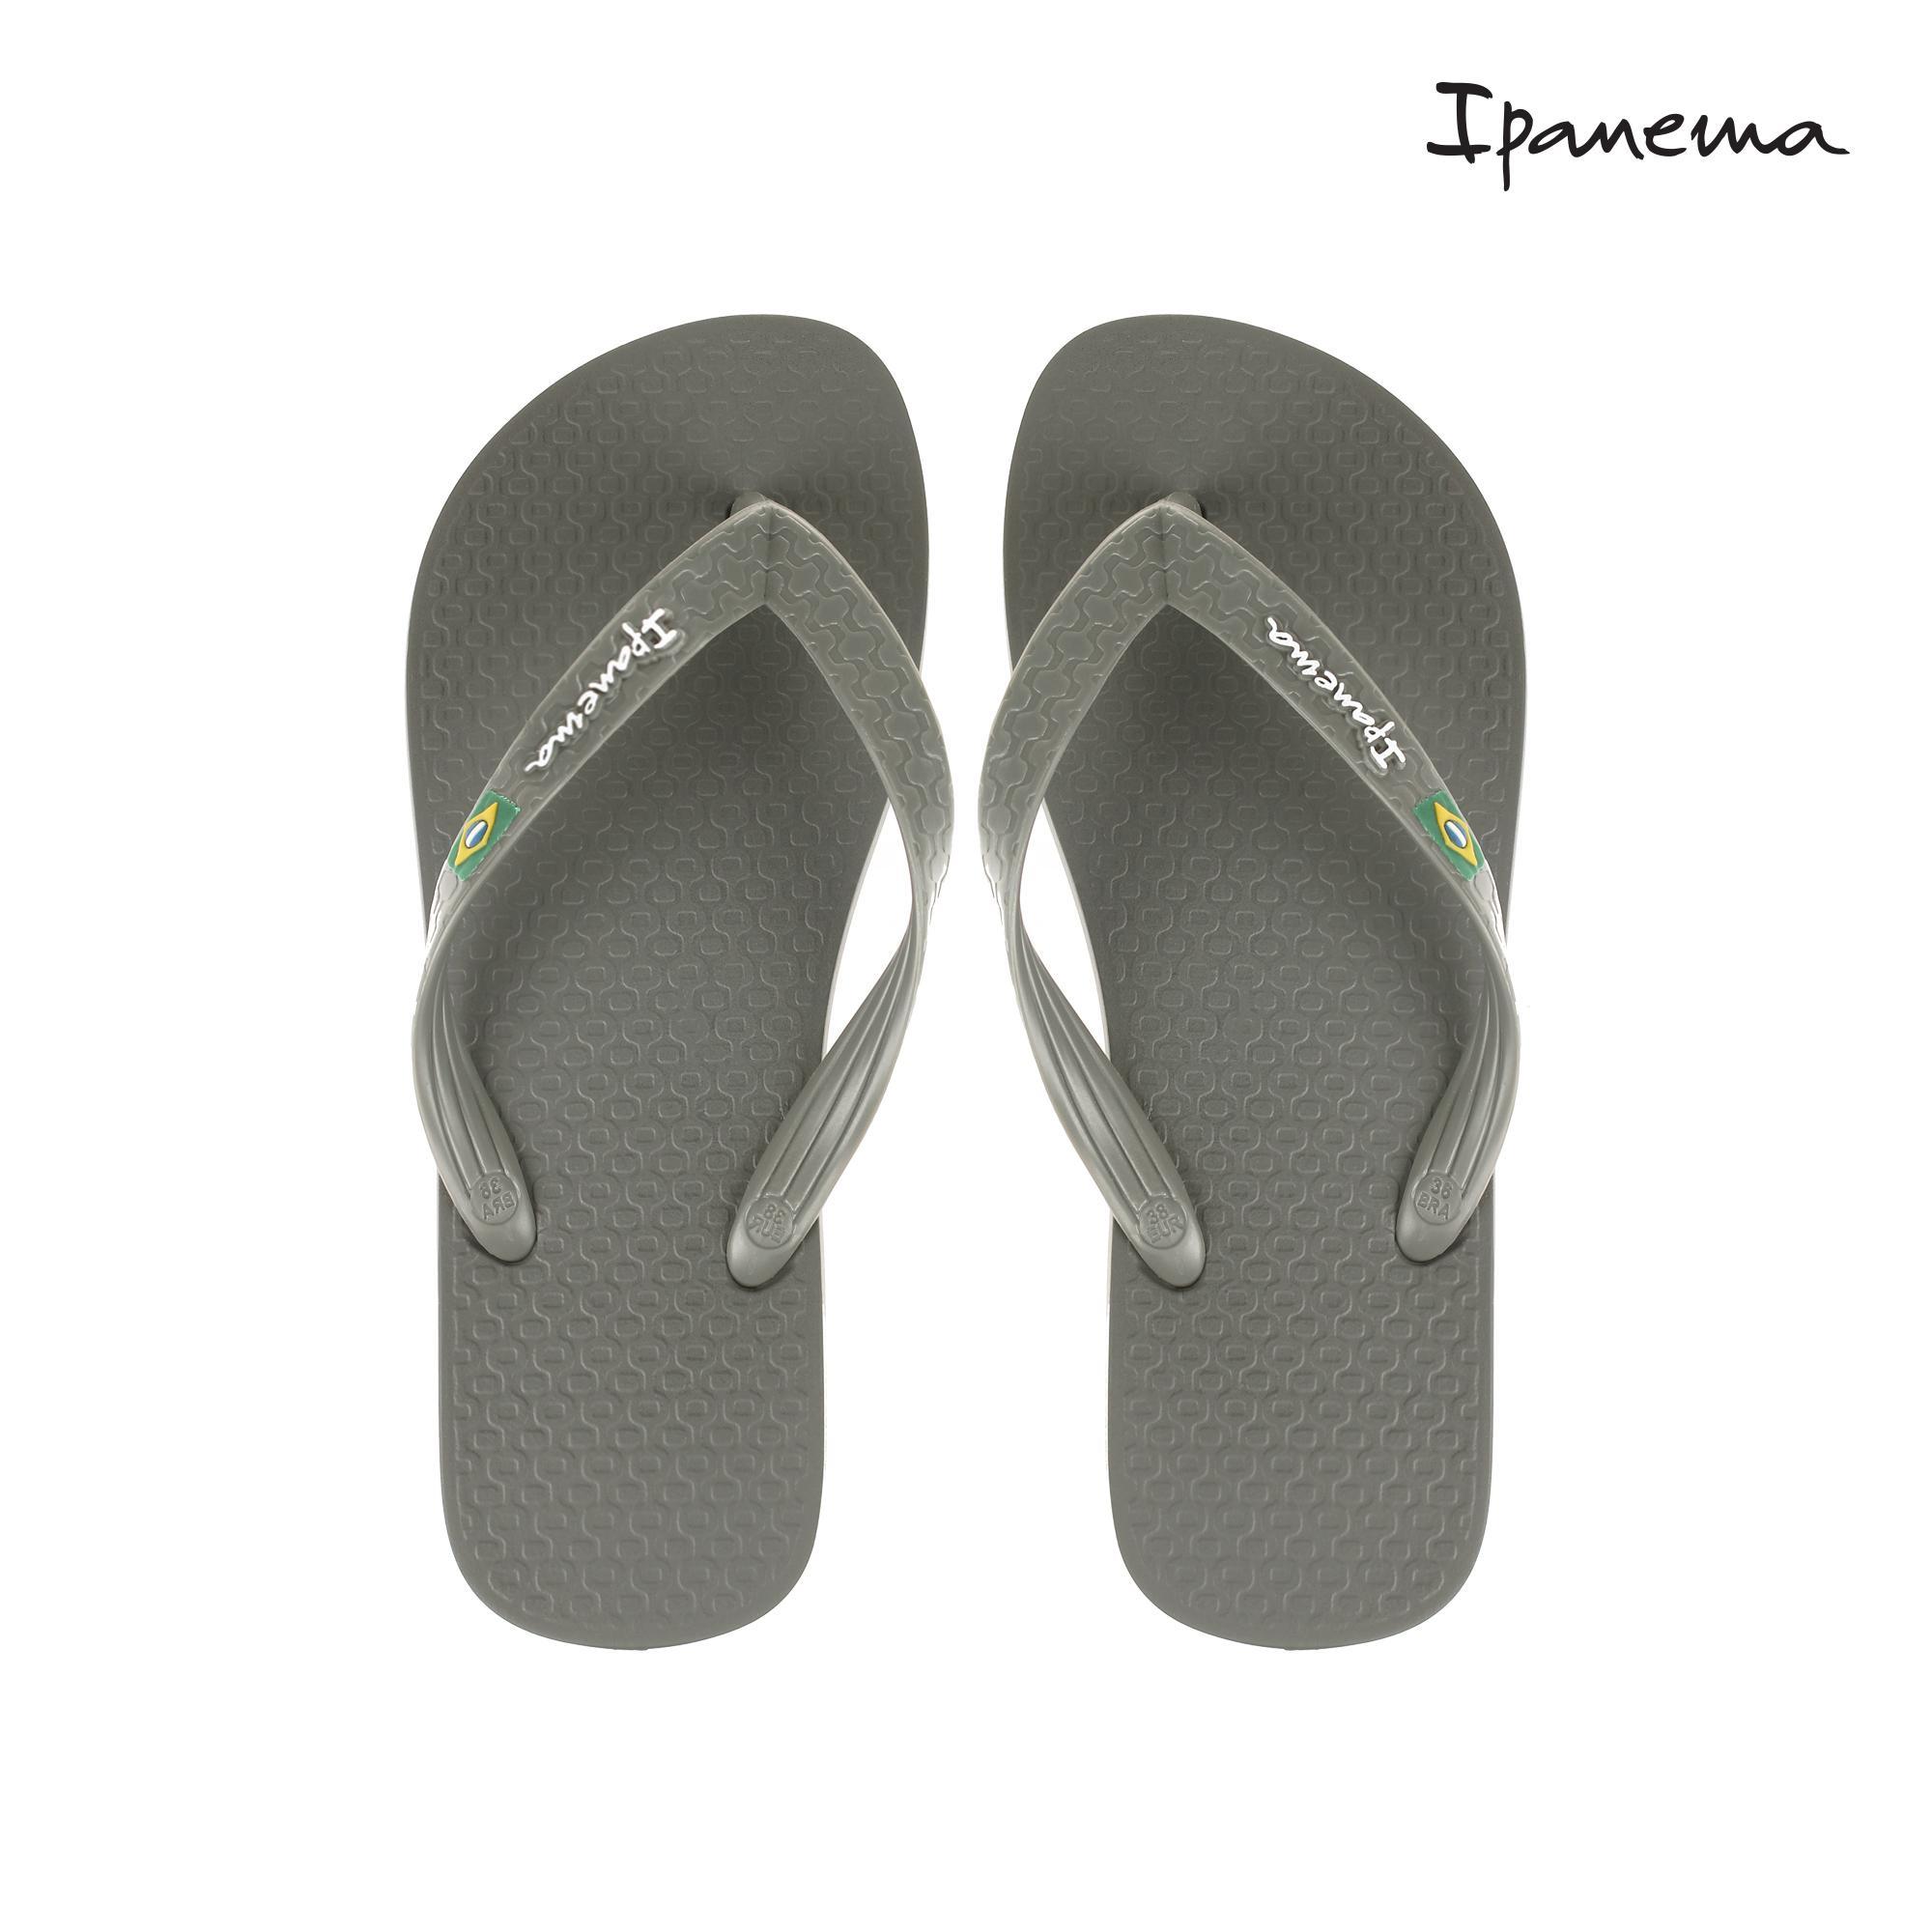 9ee8fd79e784 Ipanema Philippines  Ipanema price list - Ipanema Flip Flop ...